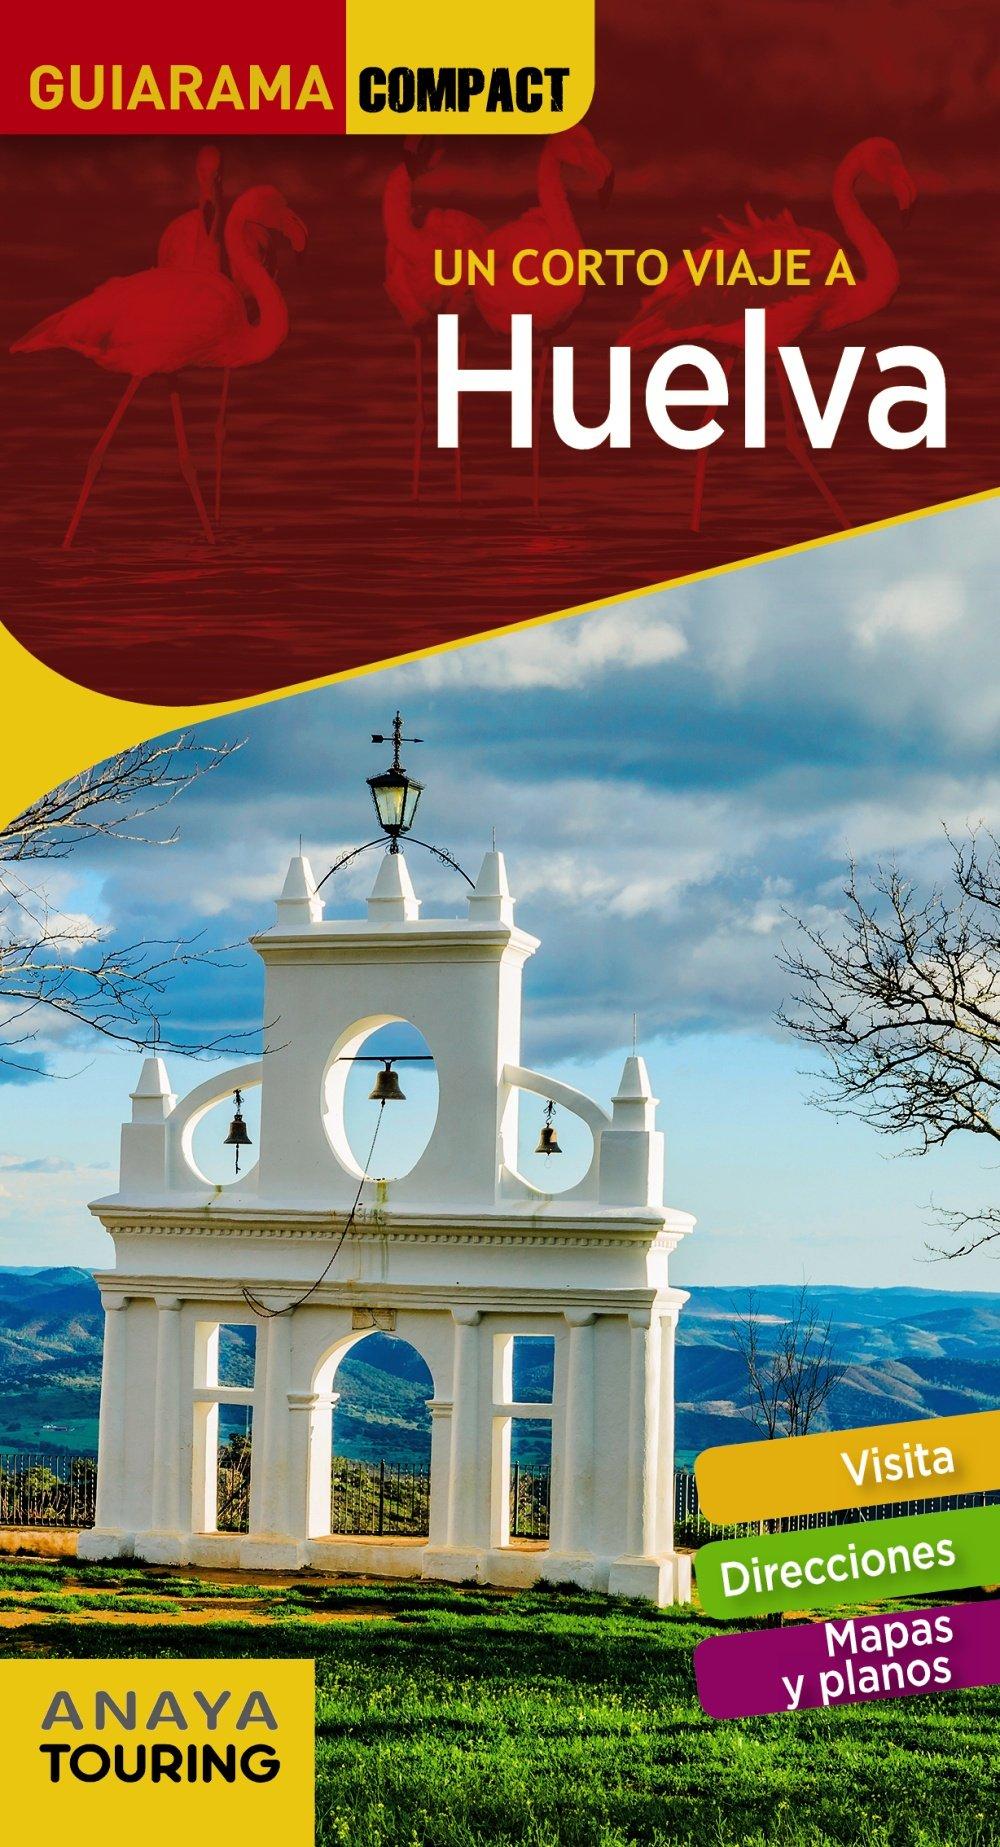 Huelva (Guiarama Compact - España) Tapa blanda – 15 feb 2018 Anaya Touring Pascual Izquierdo 8491580409 Travel & holiday guides